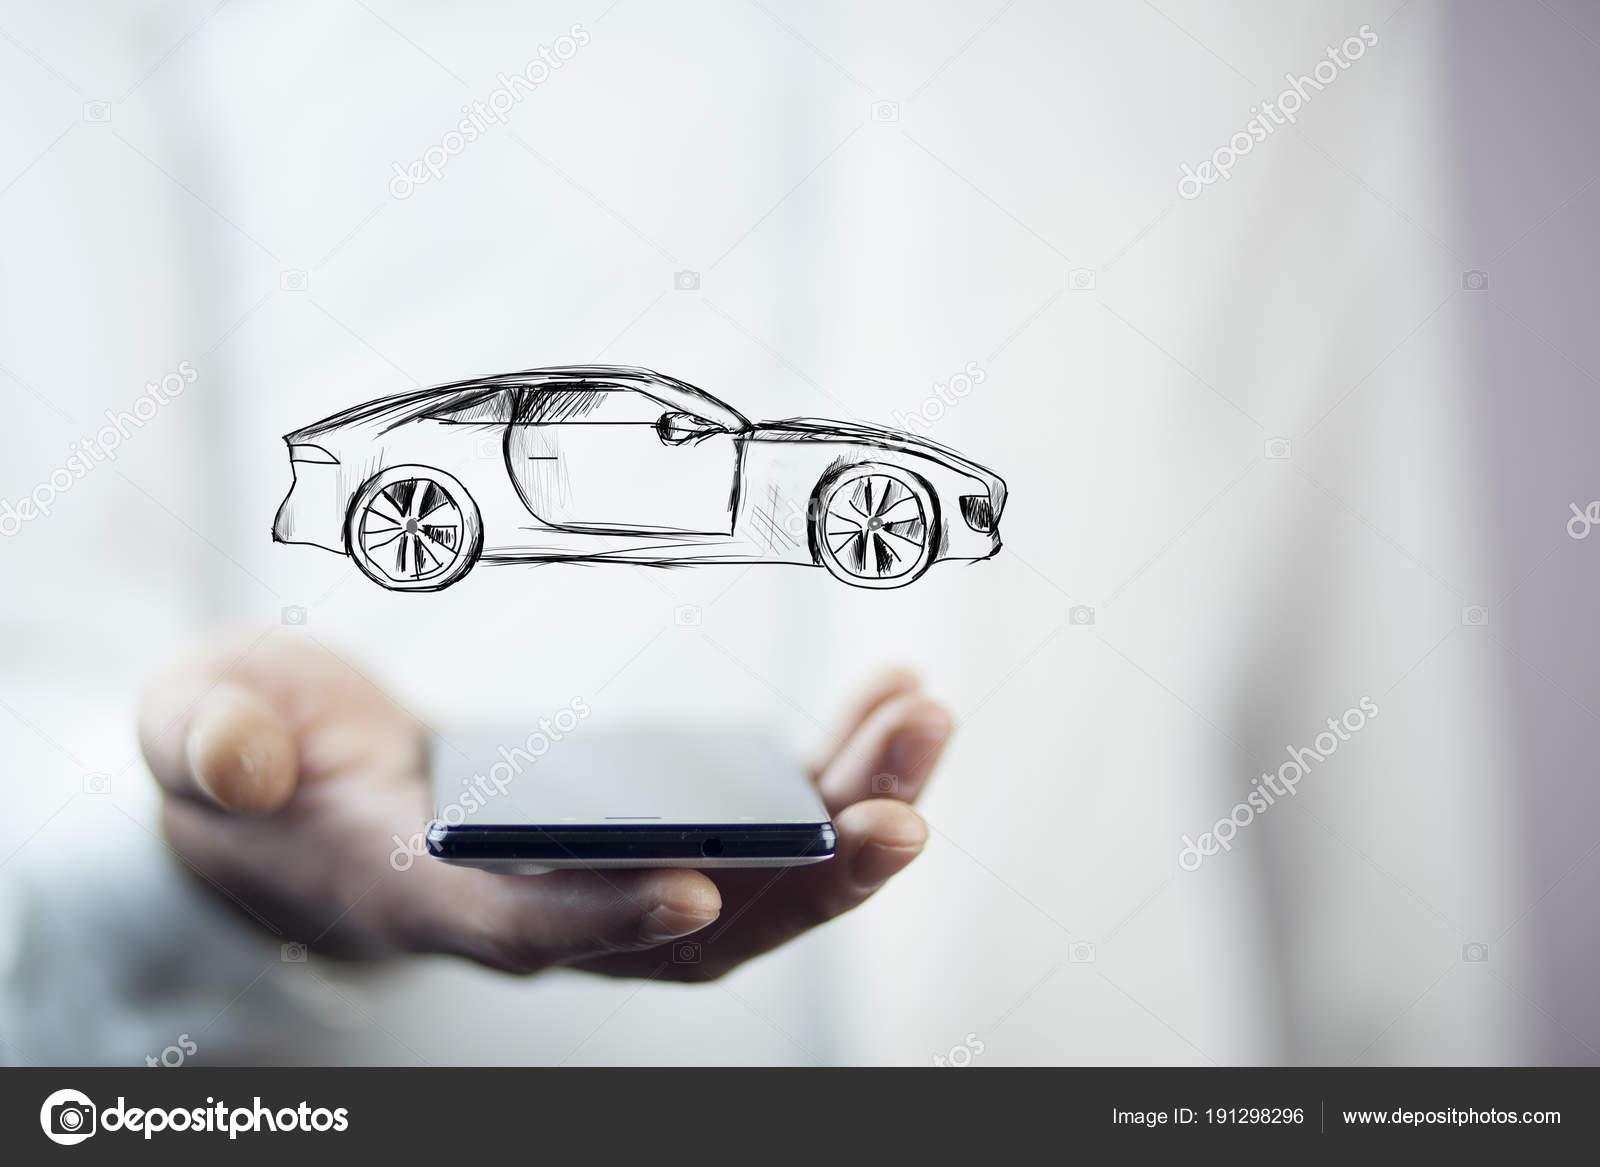 Businessman Hand Phone Car Icon Stock Photo C Tiko0305 191298296